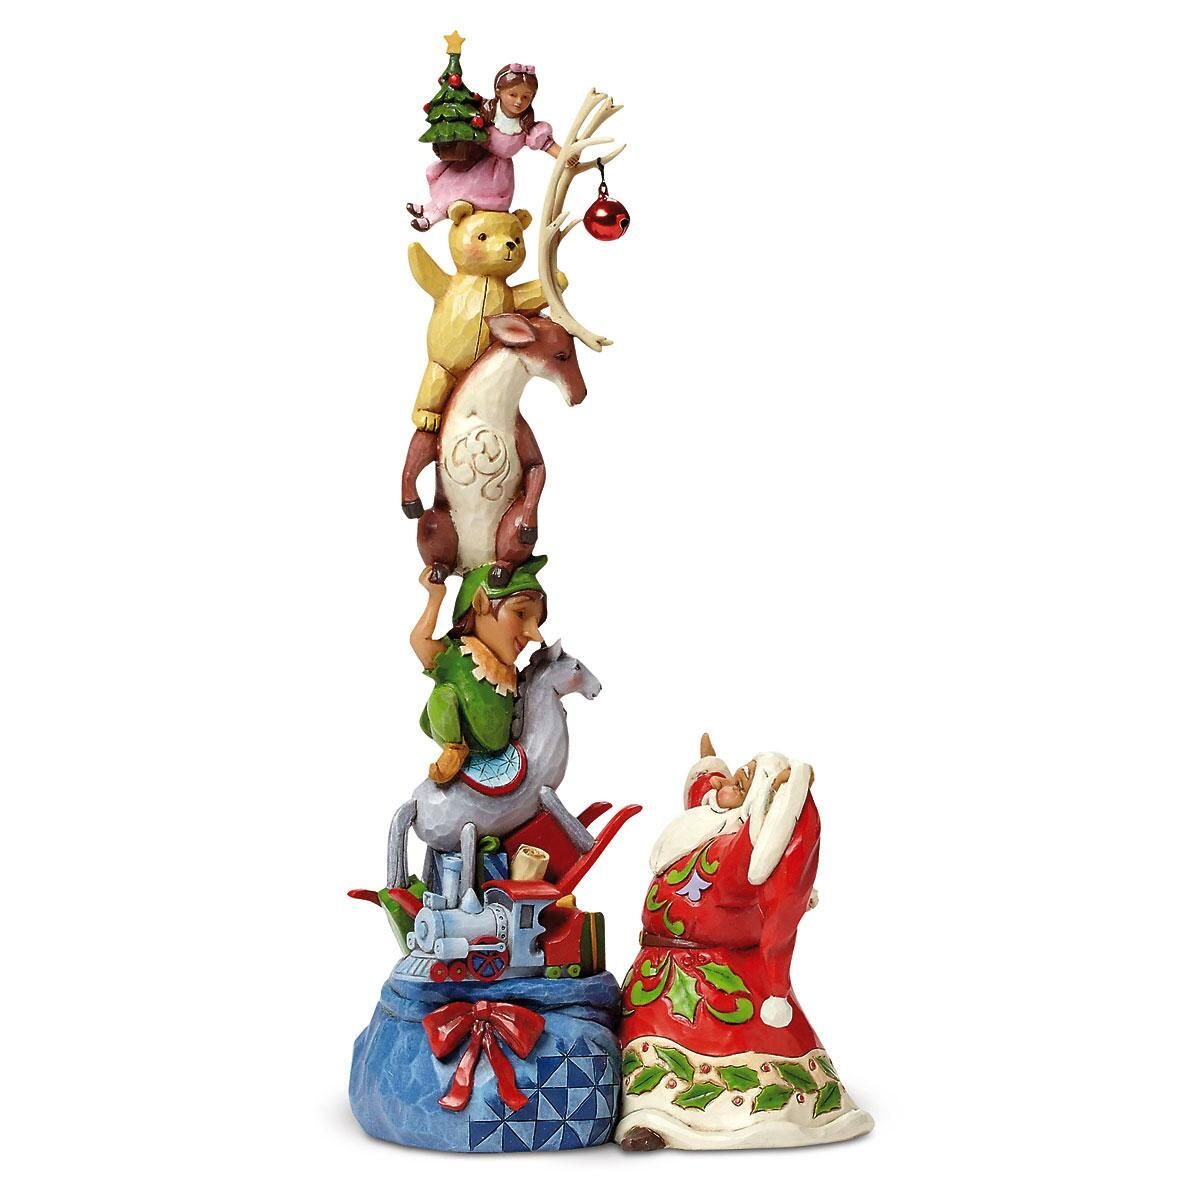 Wish Big Figurine by Jim Shore